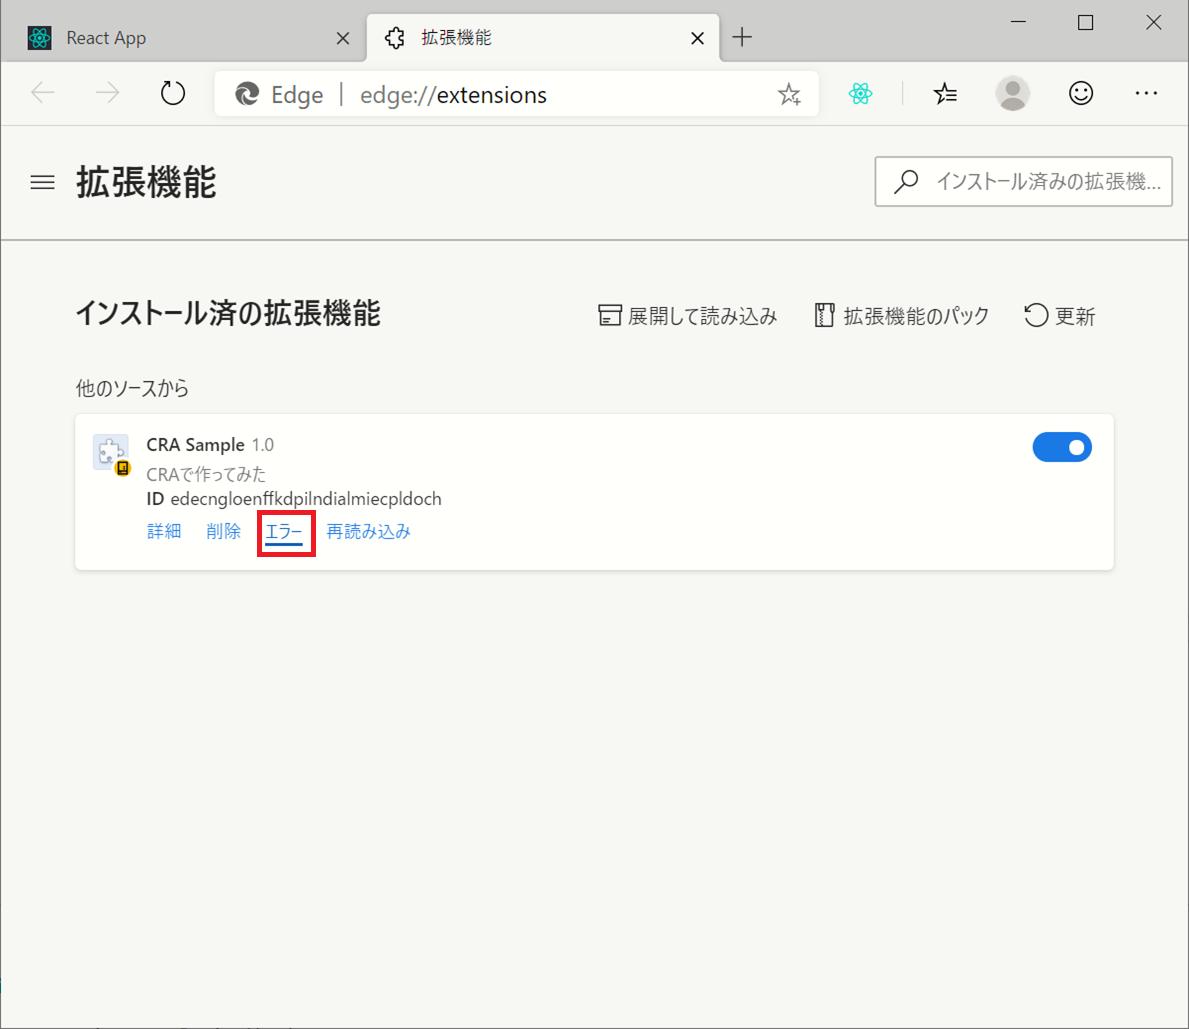 f:id:Shinji_Japan:20191115220710p:plain